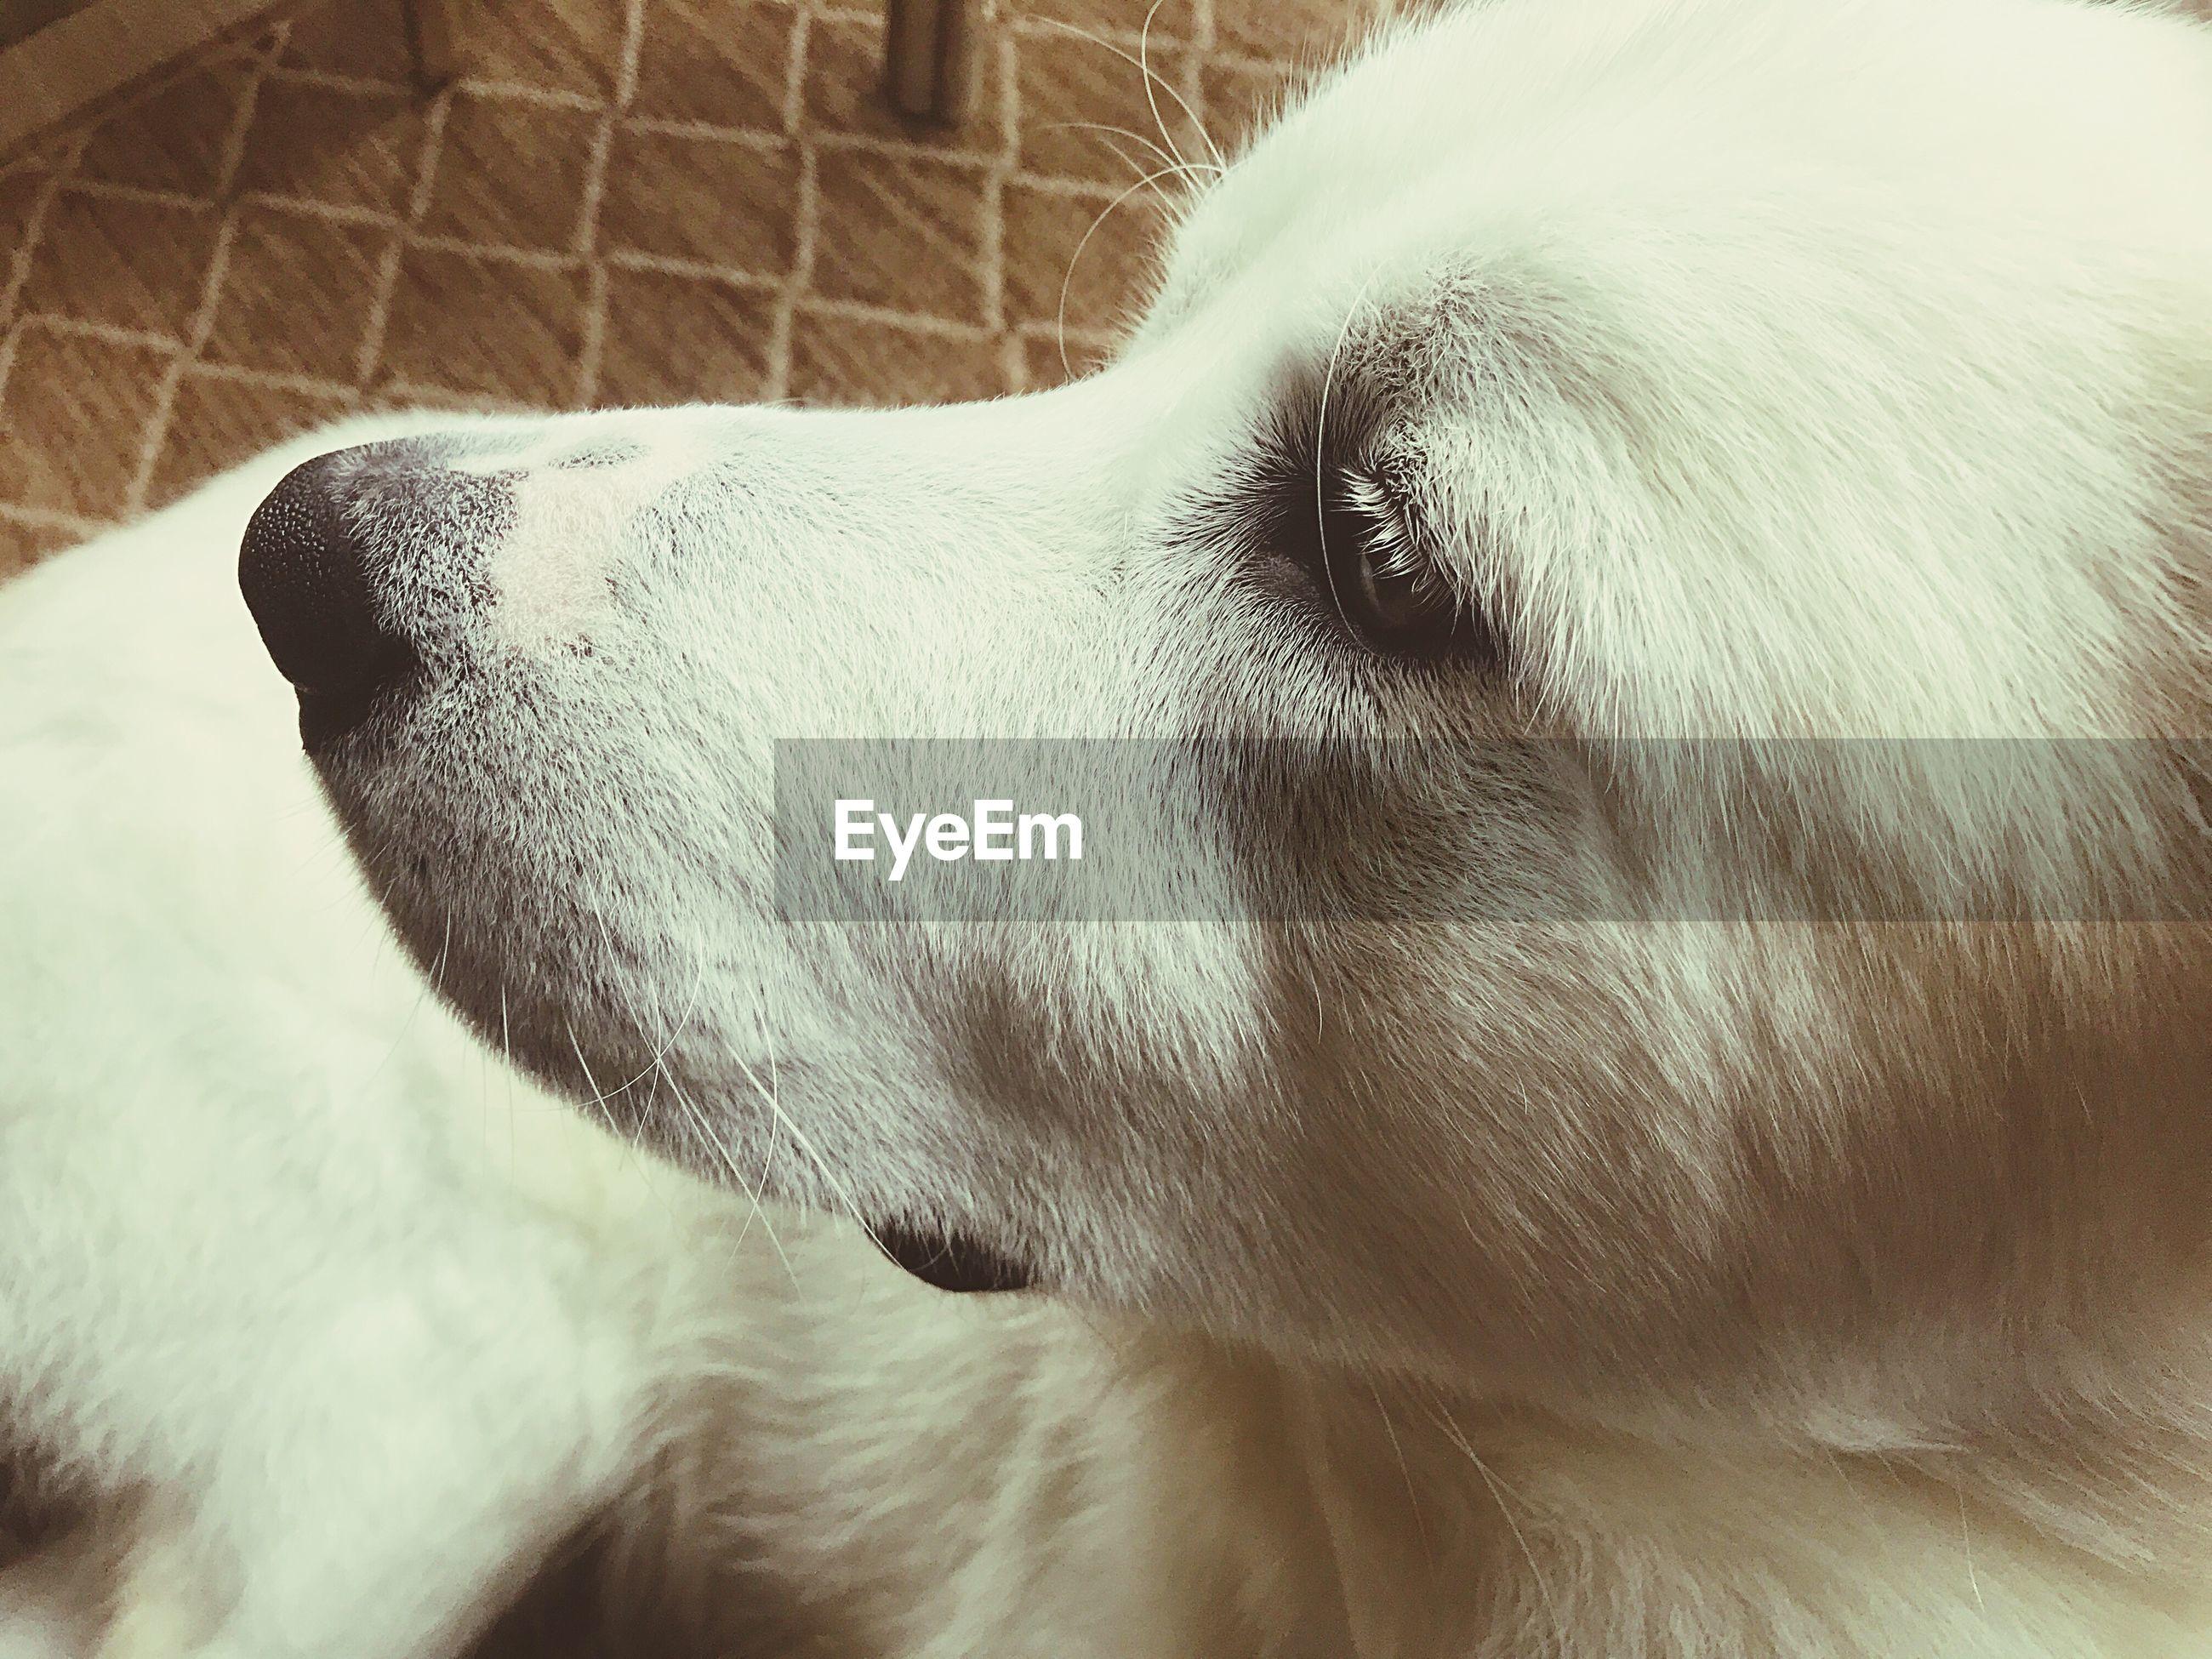 EyeEm Selects Pets Dog Animal Themes Close-up Animal Head  Day No People Zeke